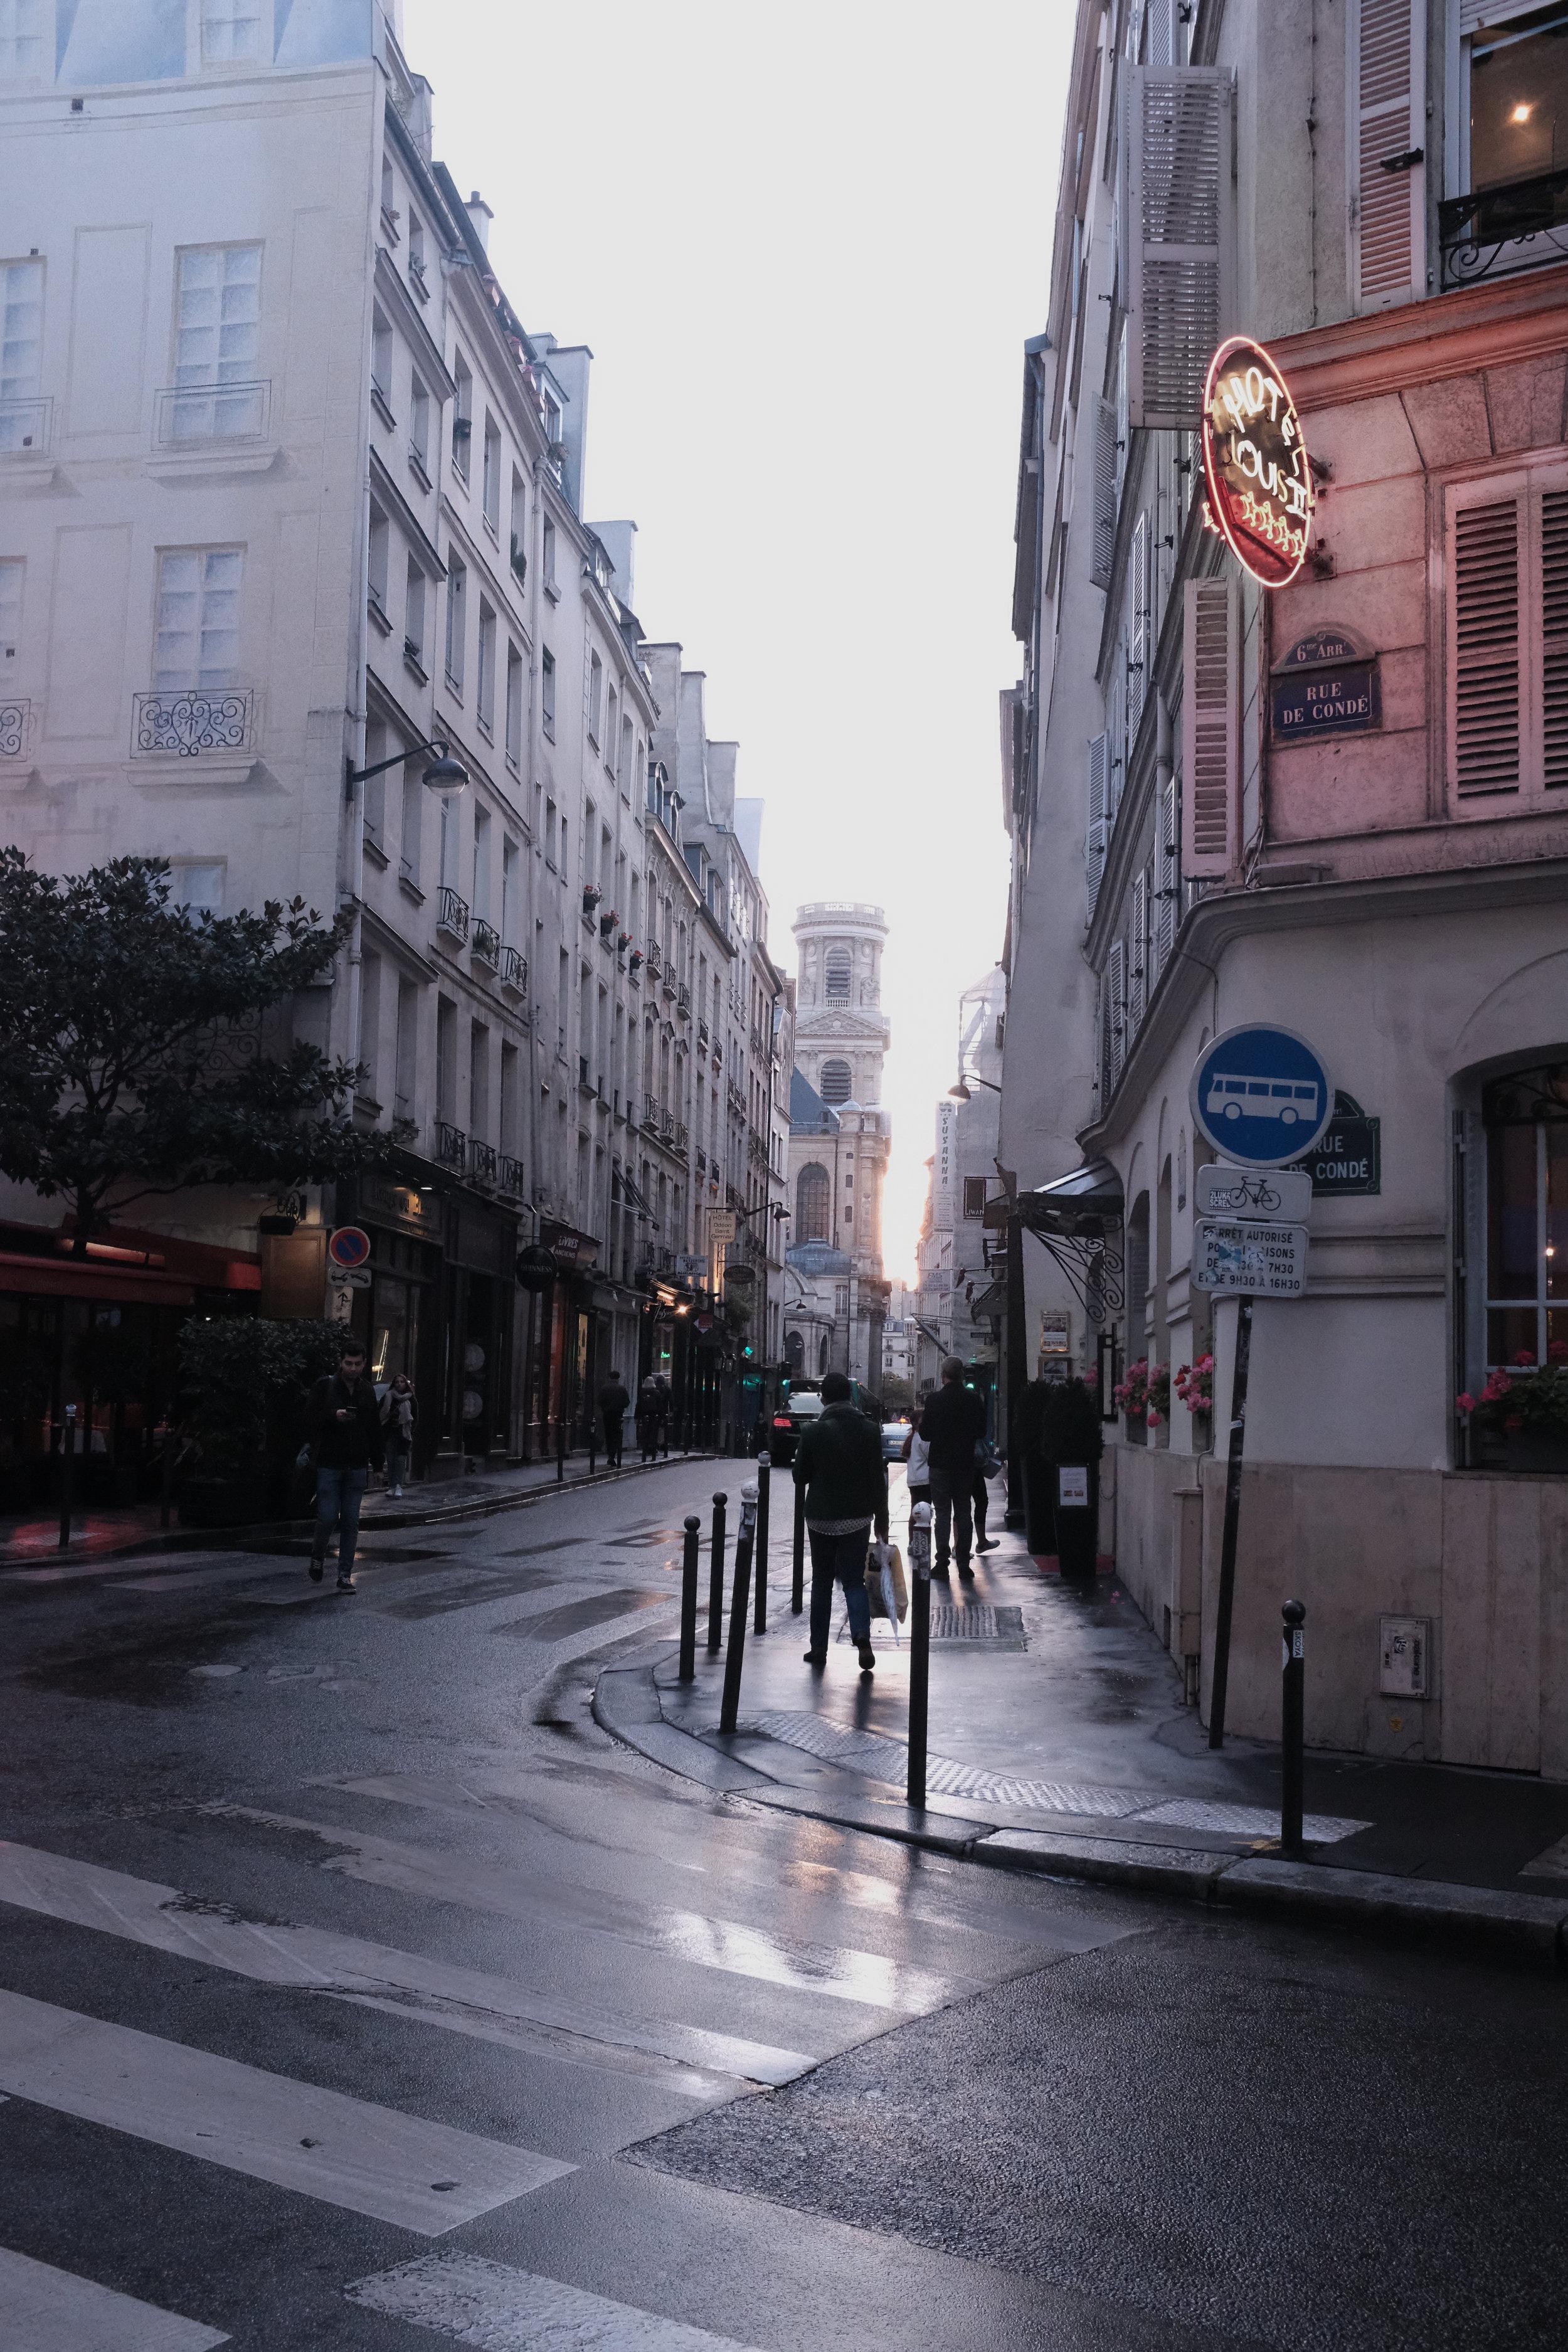 The-Look-Principle-Paris-Fashion-Week-Part2-12.jpg